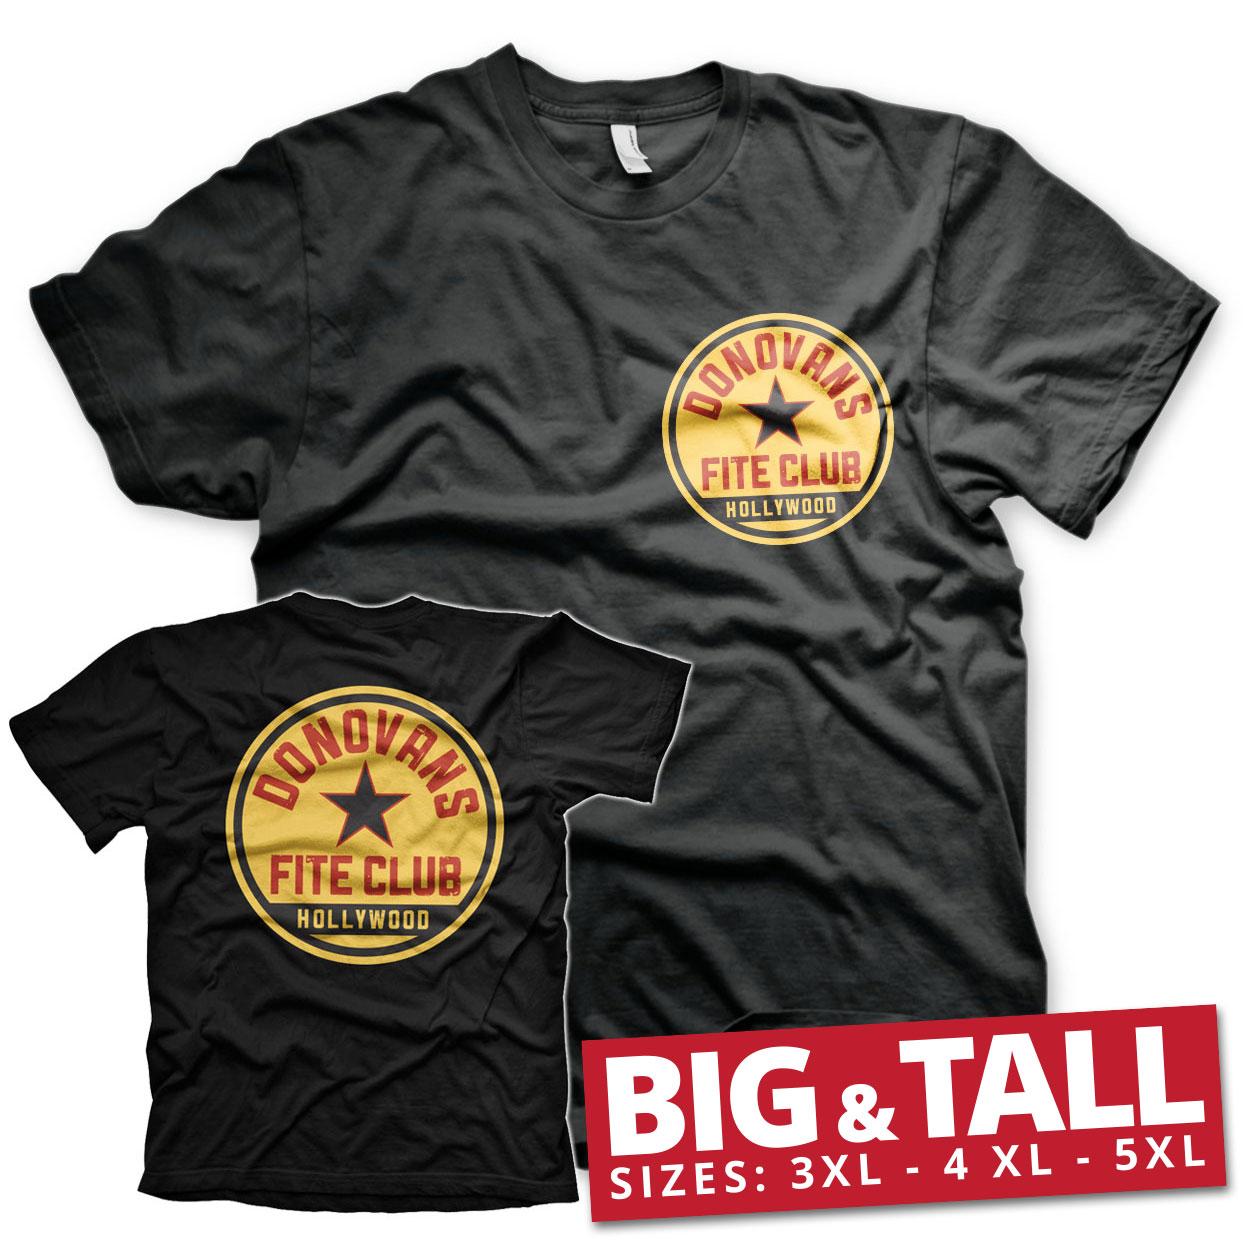 Donovans Fite Club Big & Tall T-Shirt